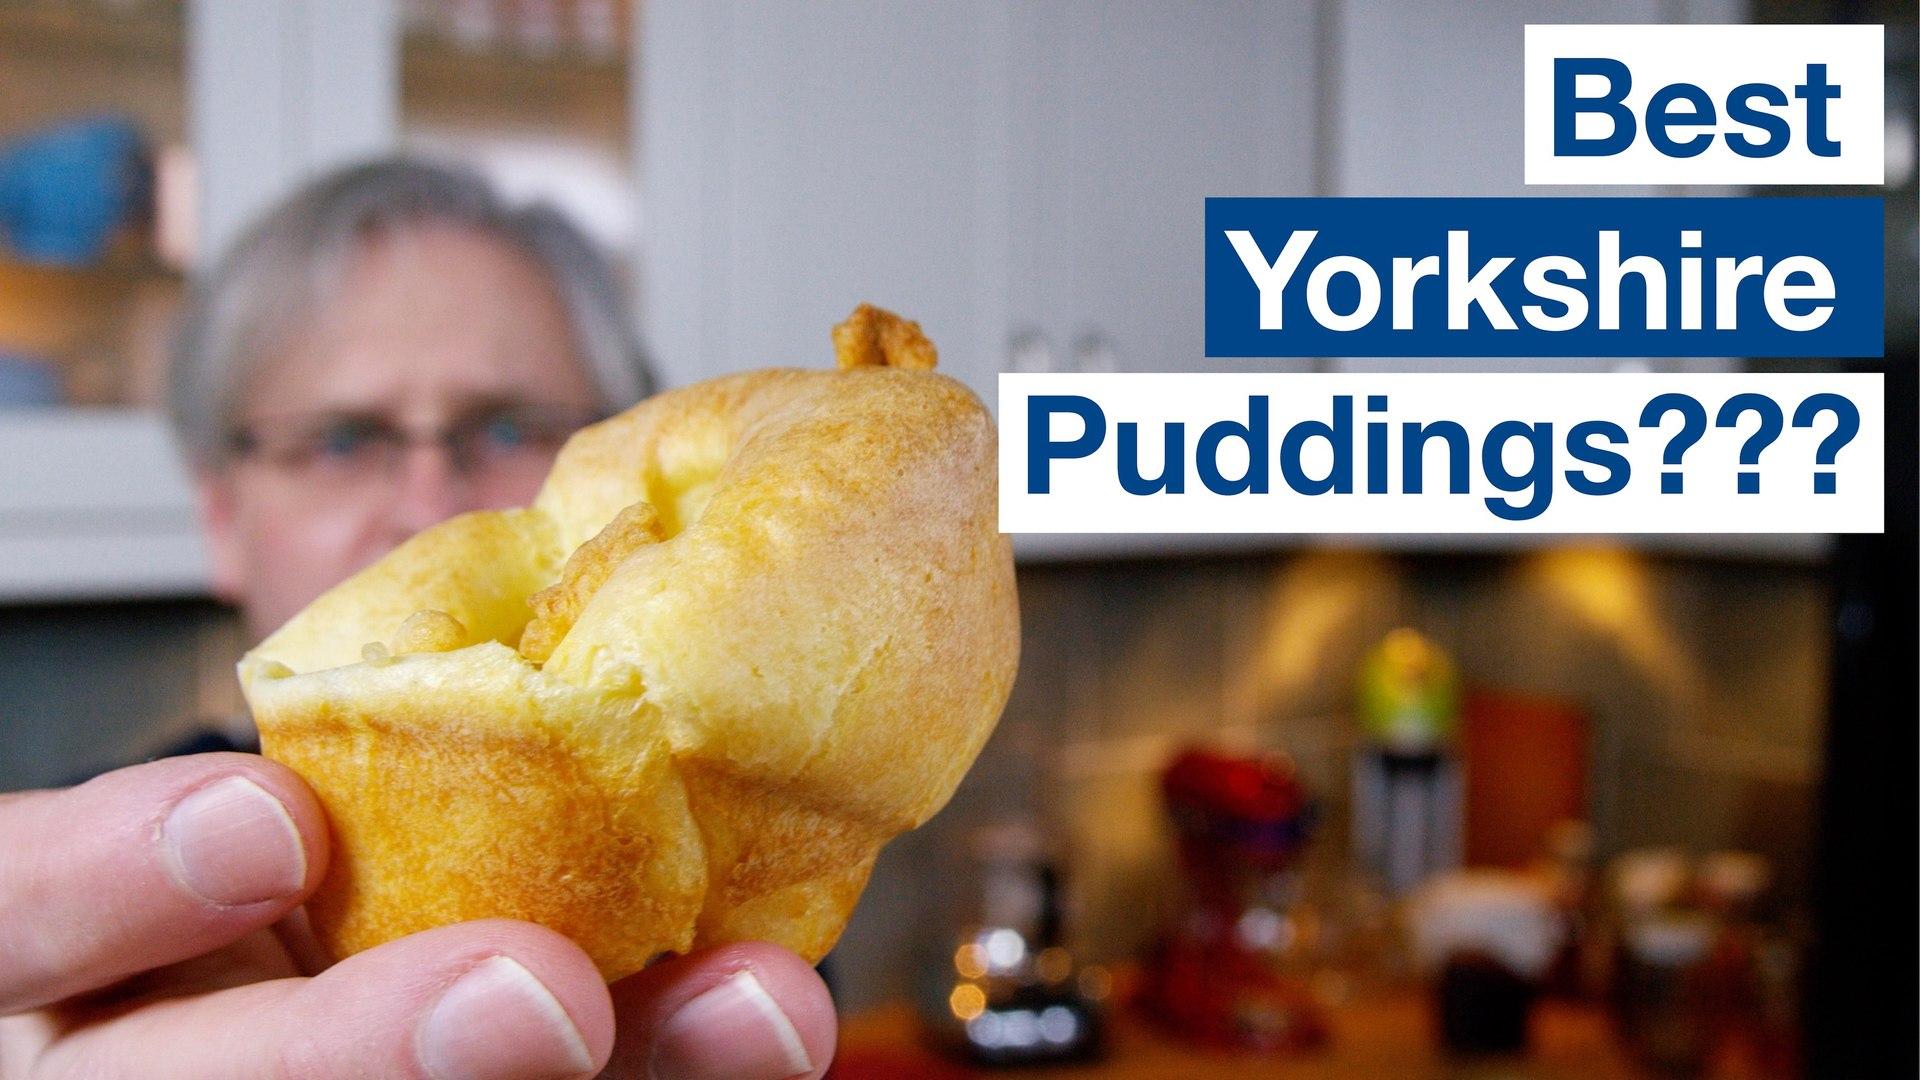 We Made Jamie Oliver's Yorkshire Pudding Recipe